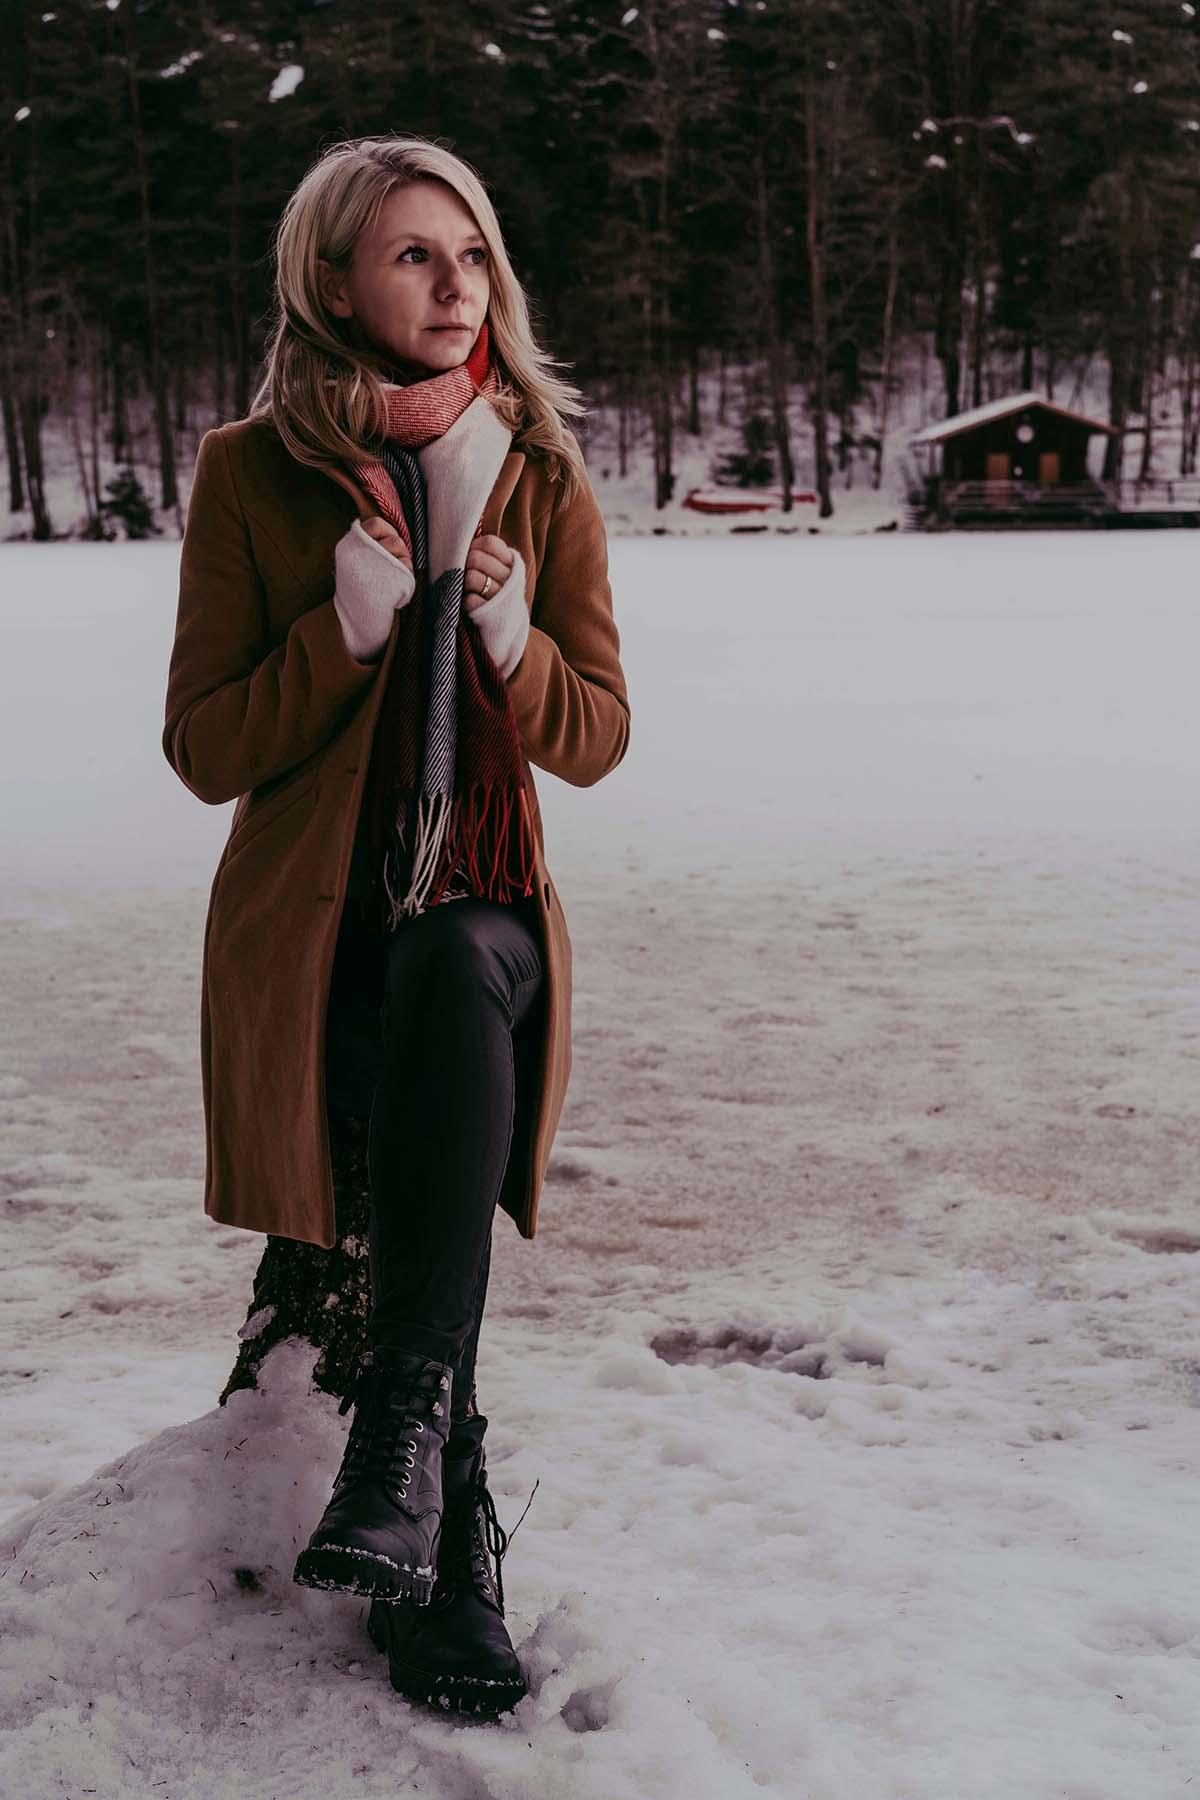 dreiburgensee-winter-frau